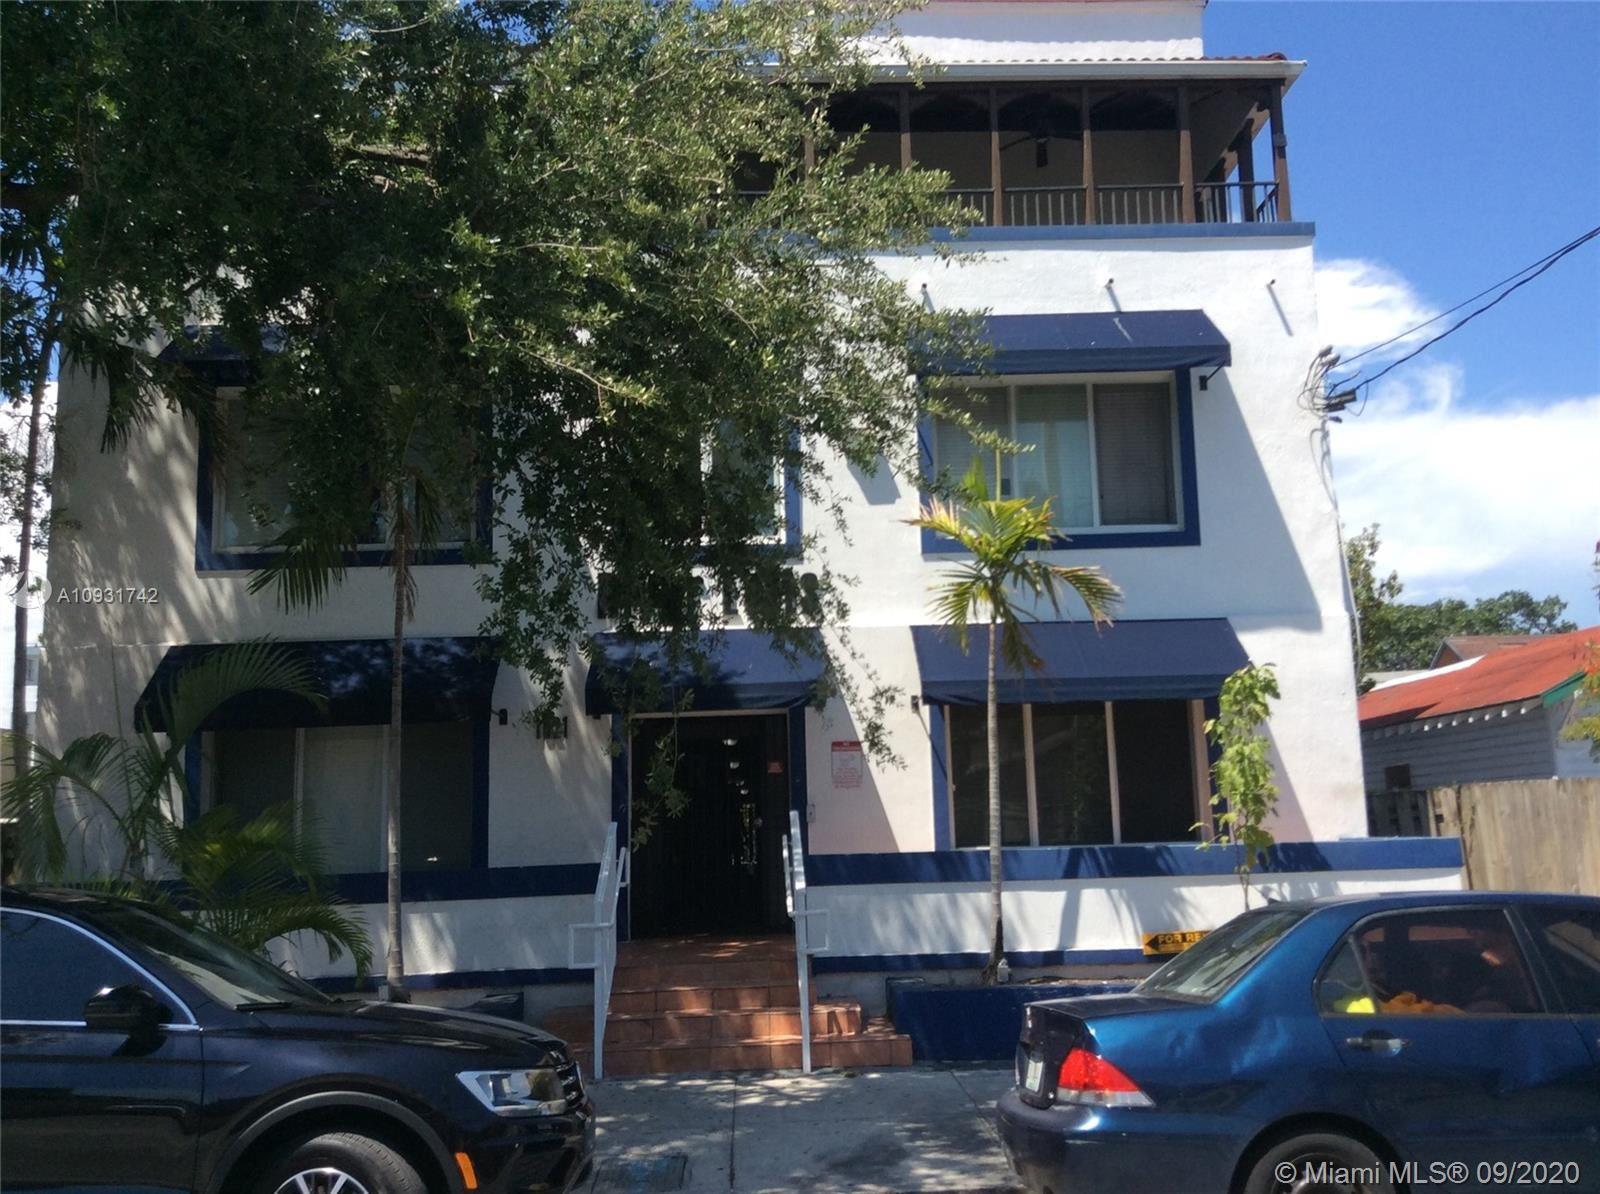 1021 NW 3rd St #305, Miami, FL 33128 - #: A10931742